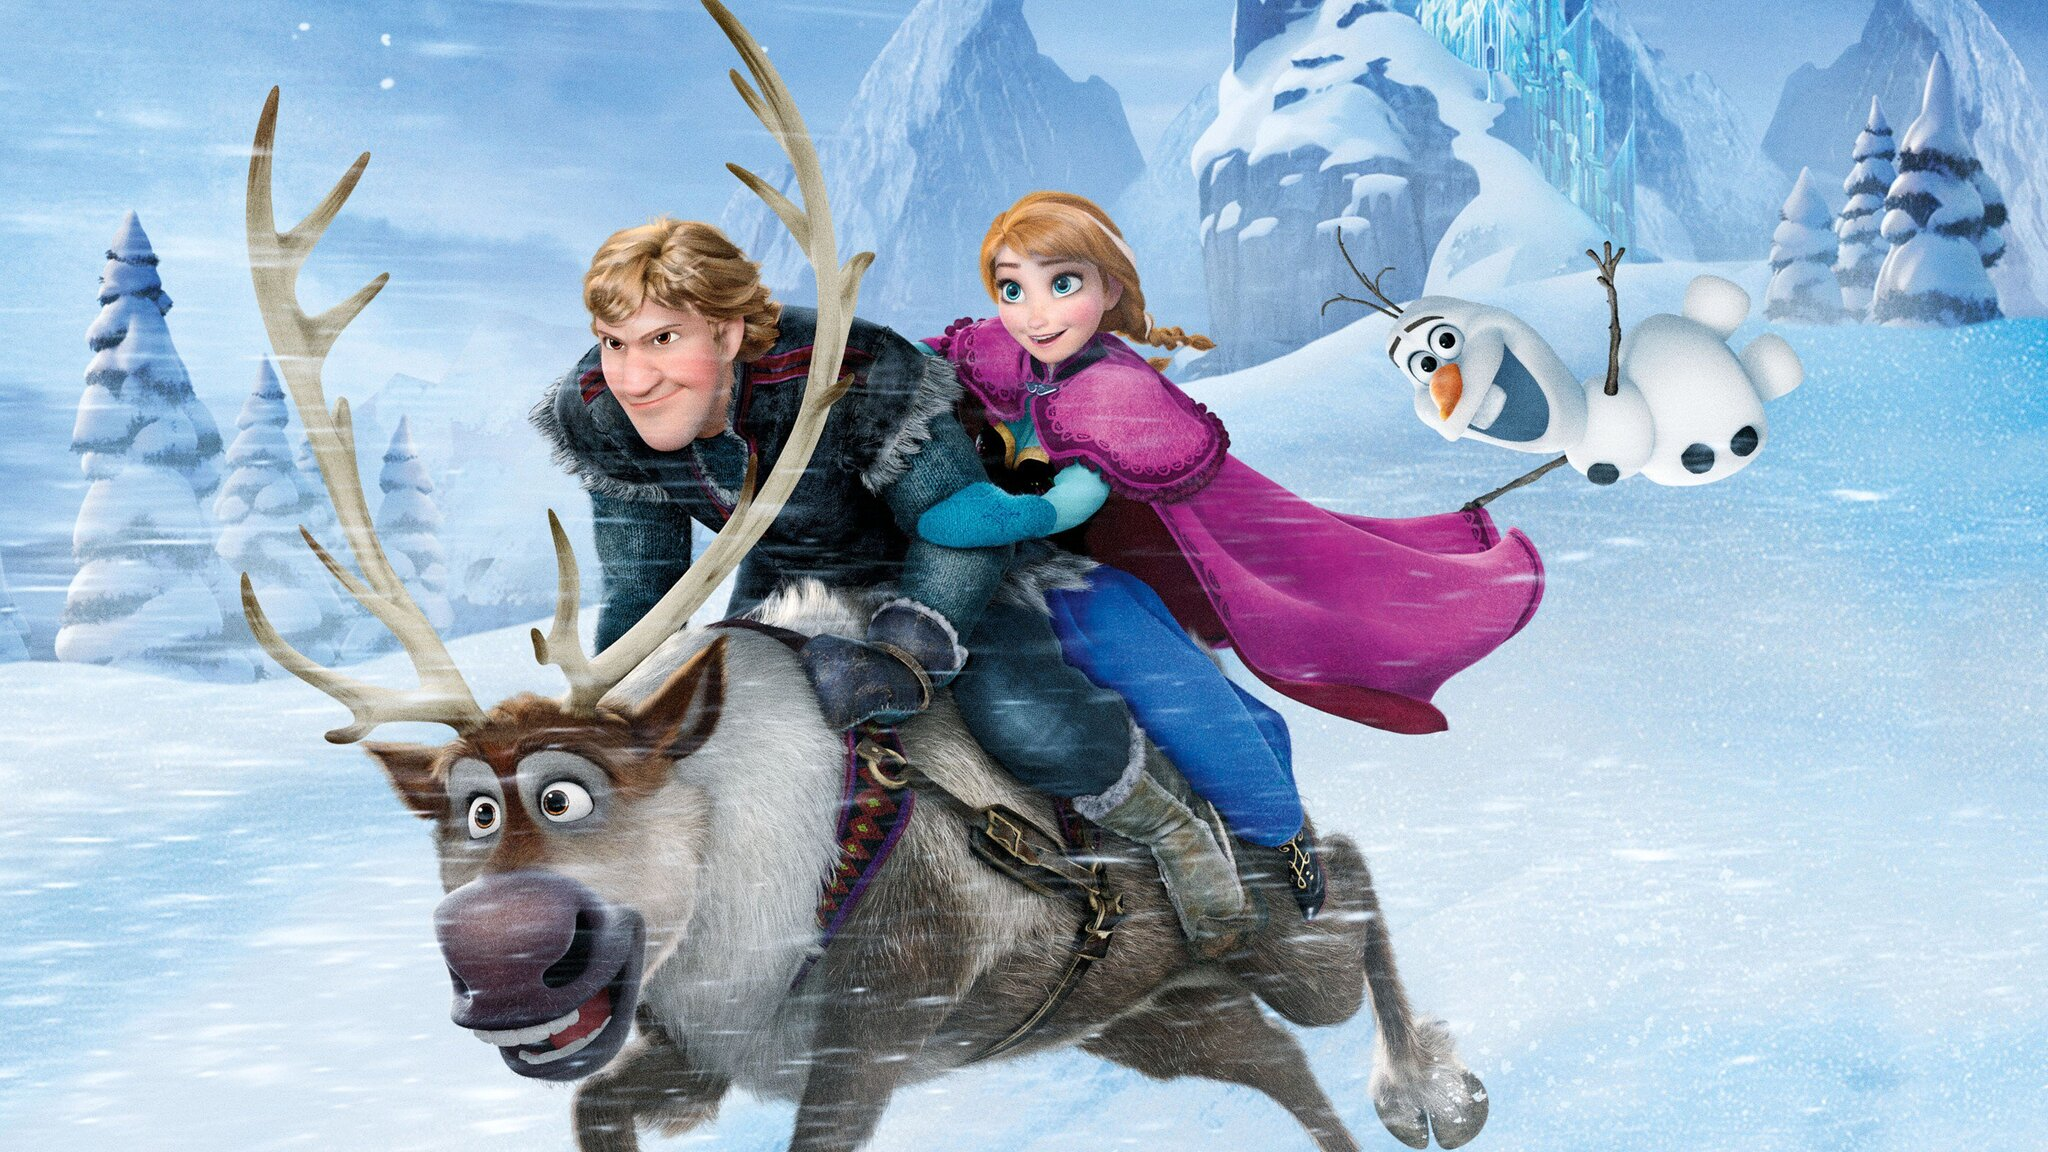 2048x1152 Frozen Movie Pc Resolution HD 4k Wallpapers